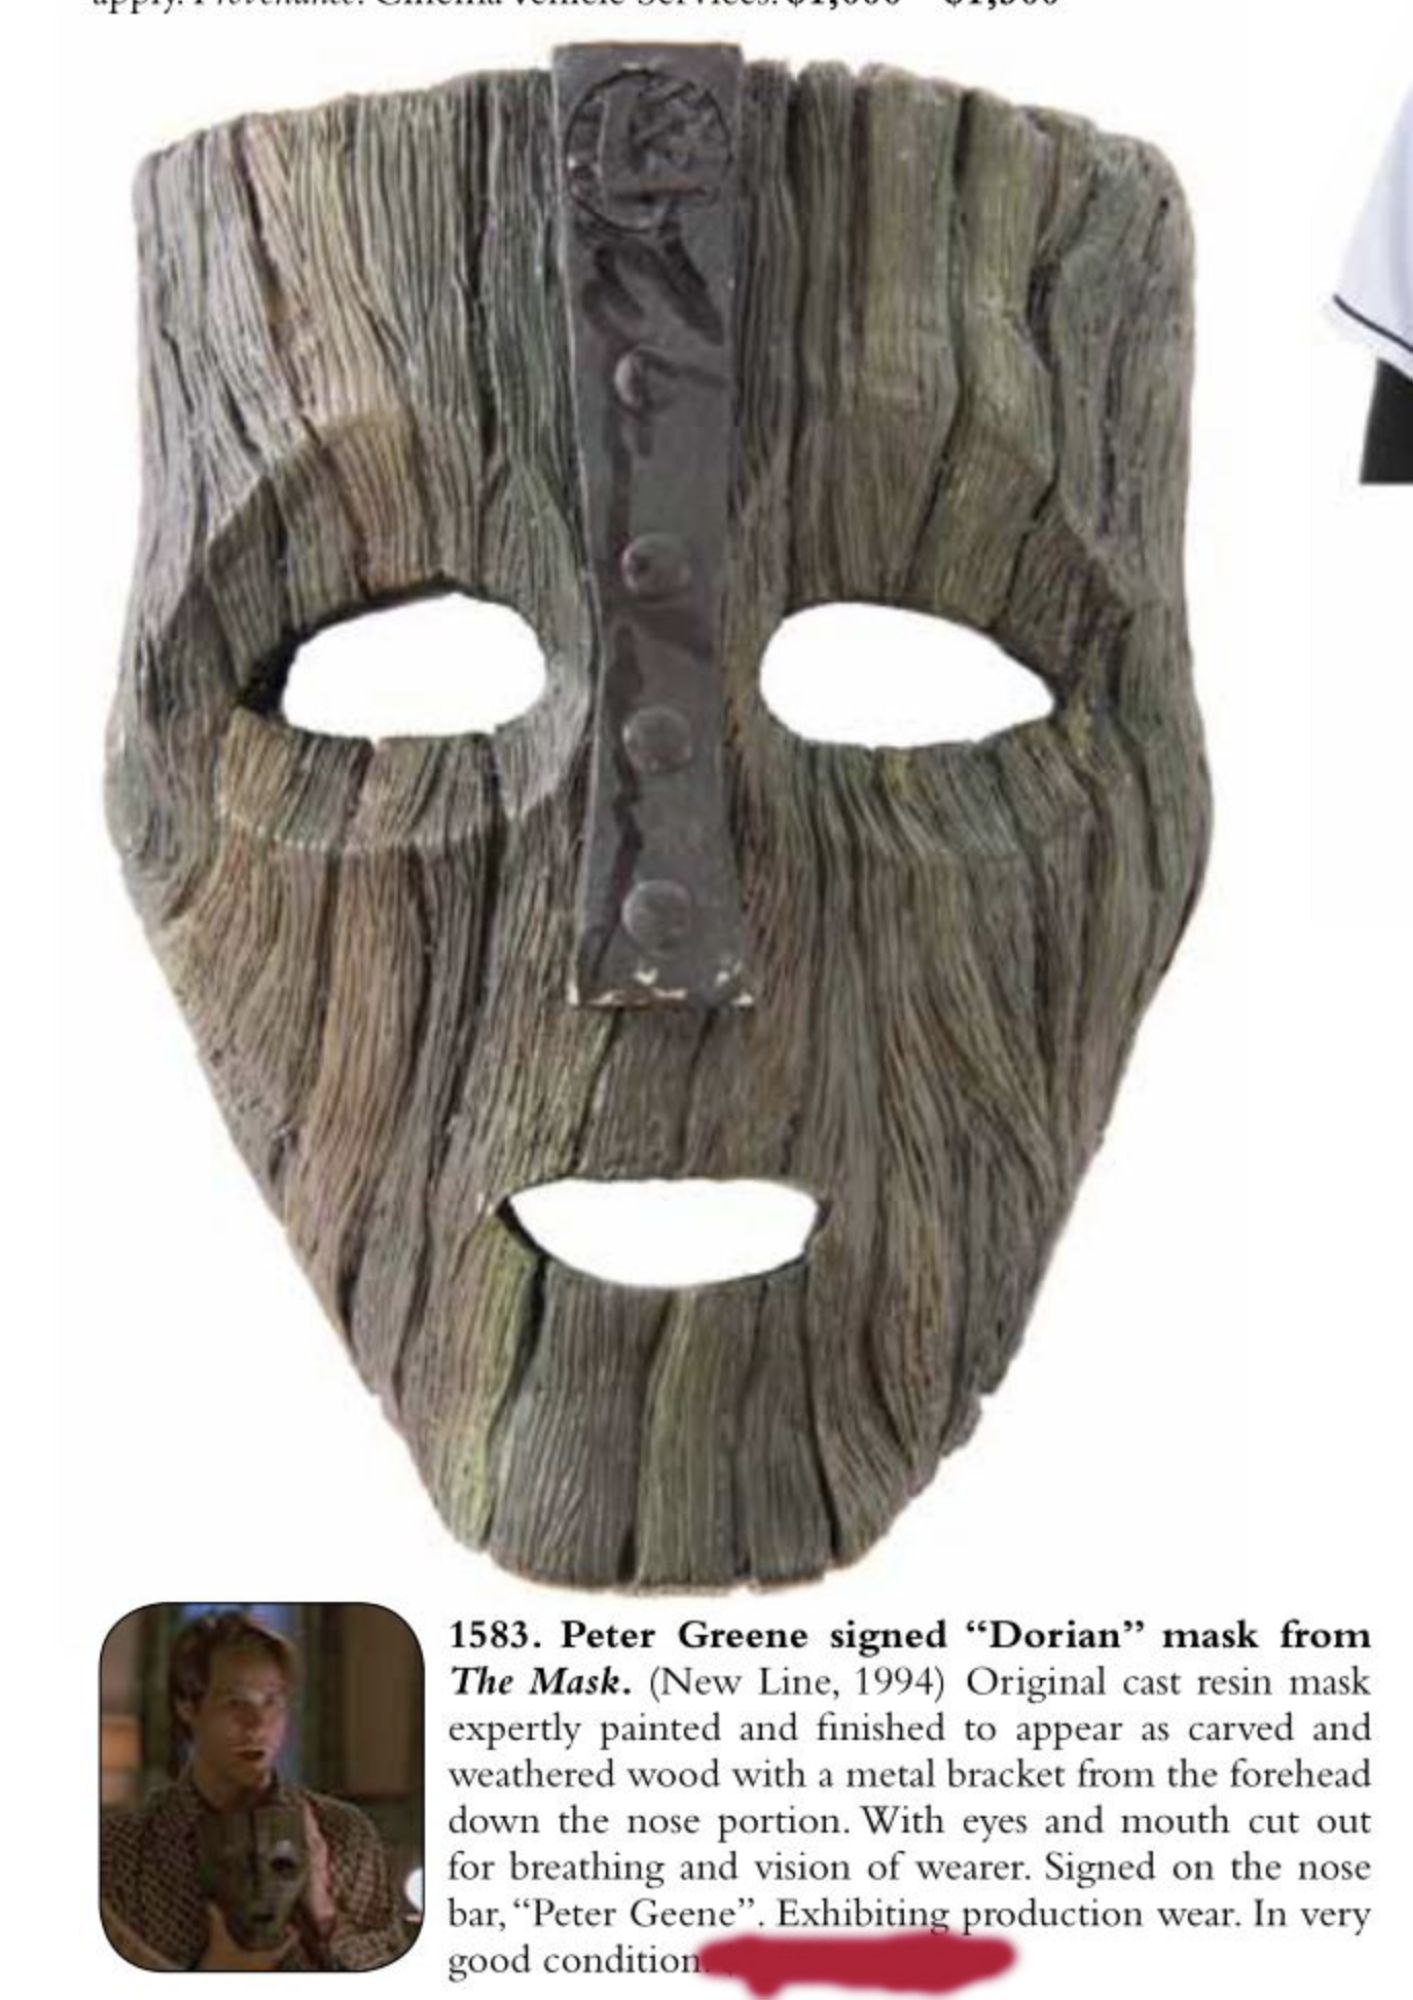 07-The-Mask-Mask